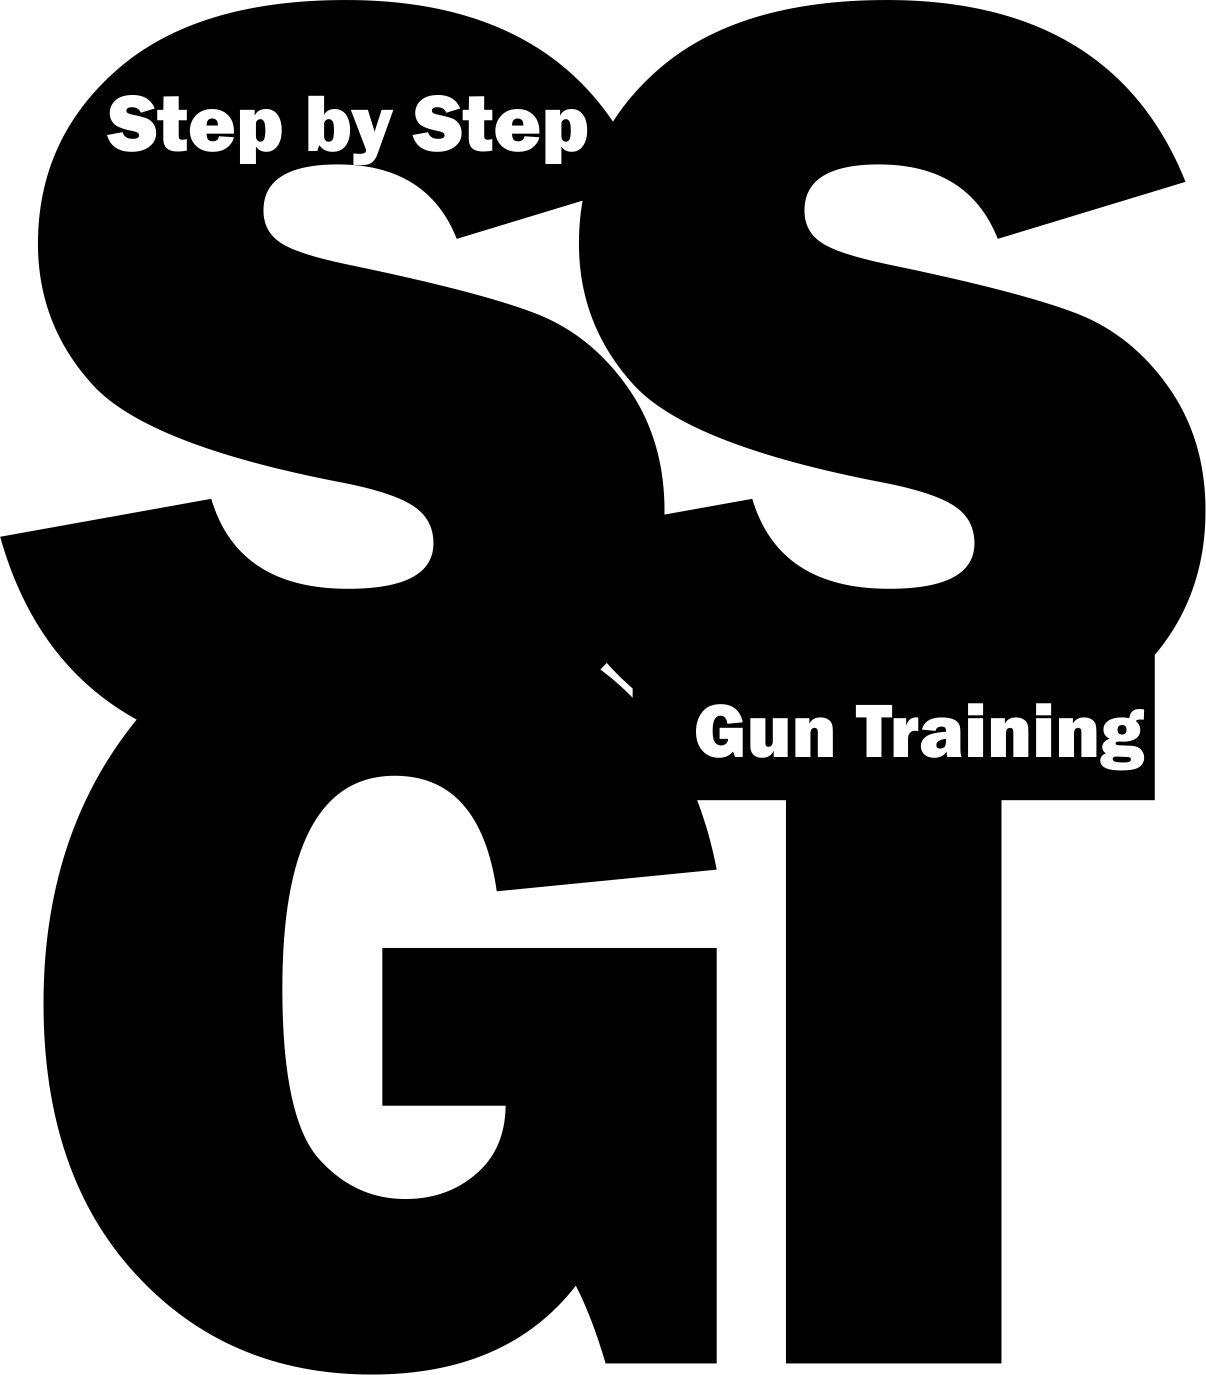 Ssgt logo 3 ssgt ssgt logo 3 buycottarizona